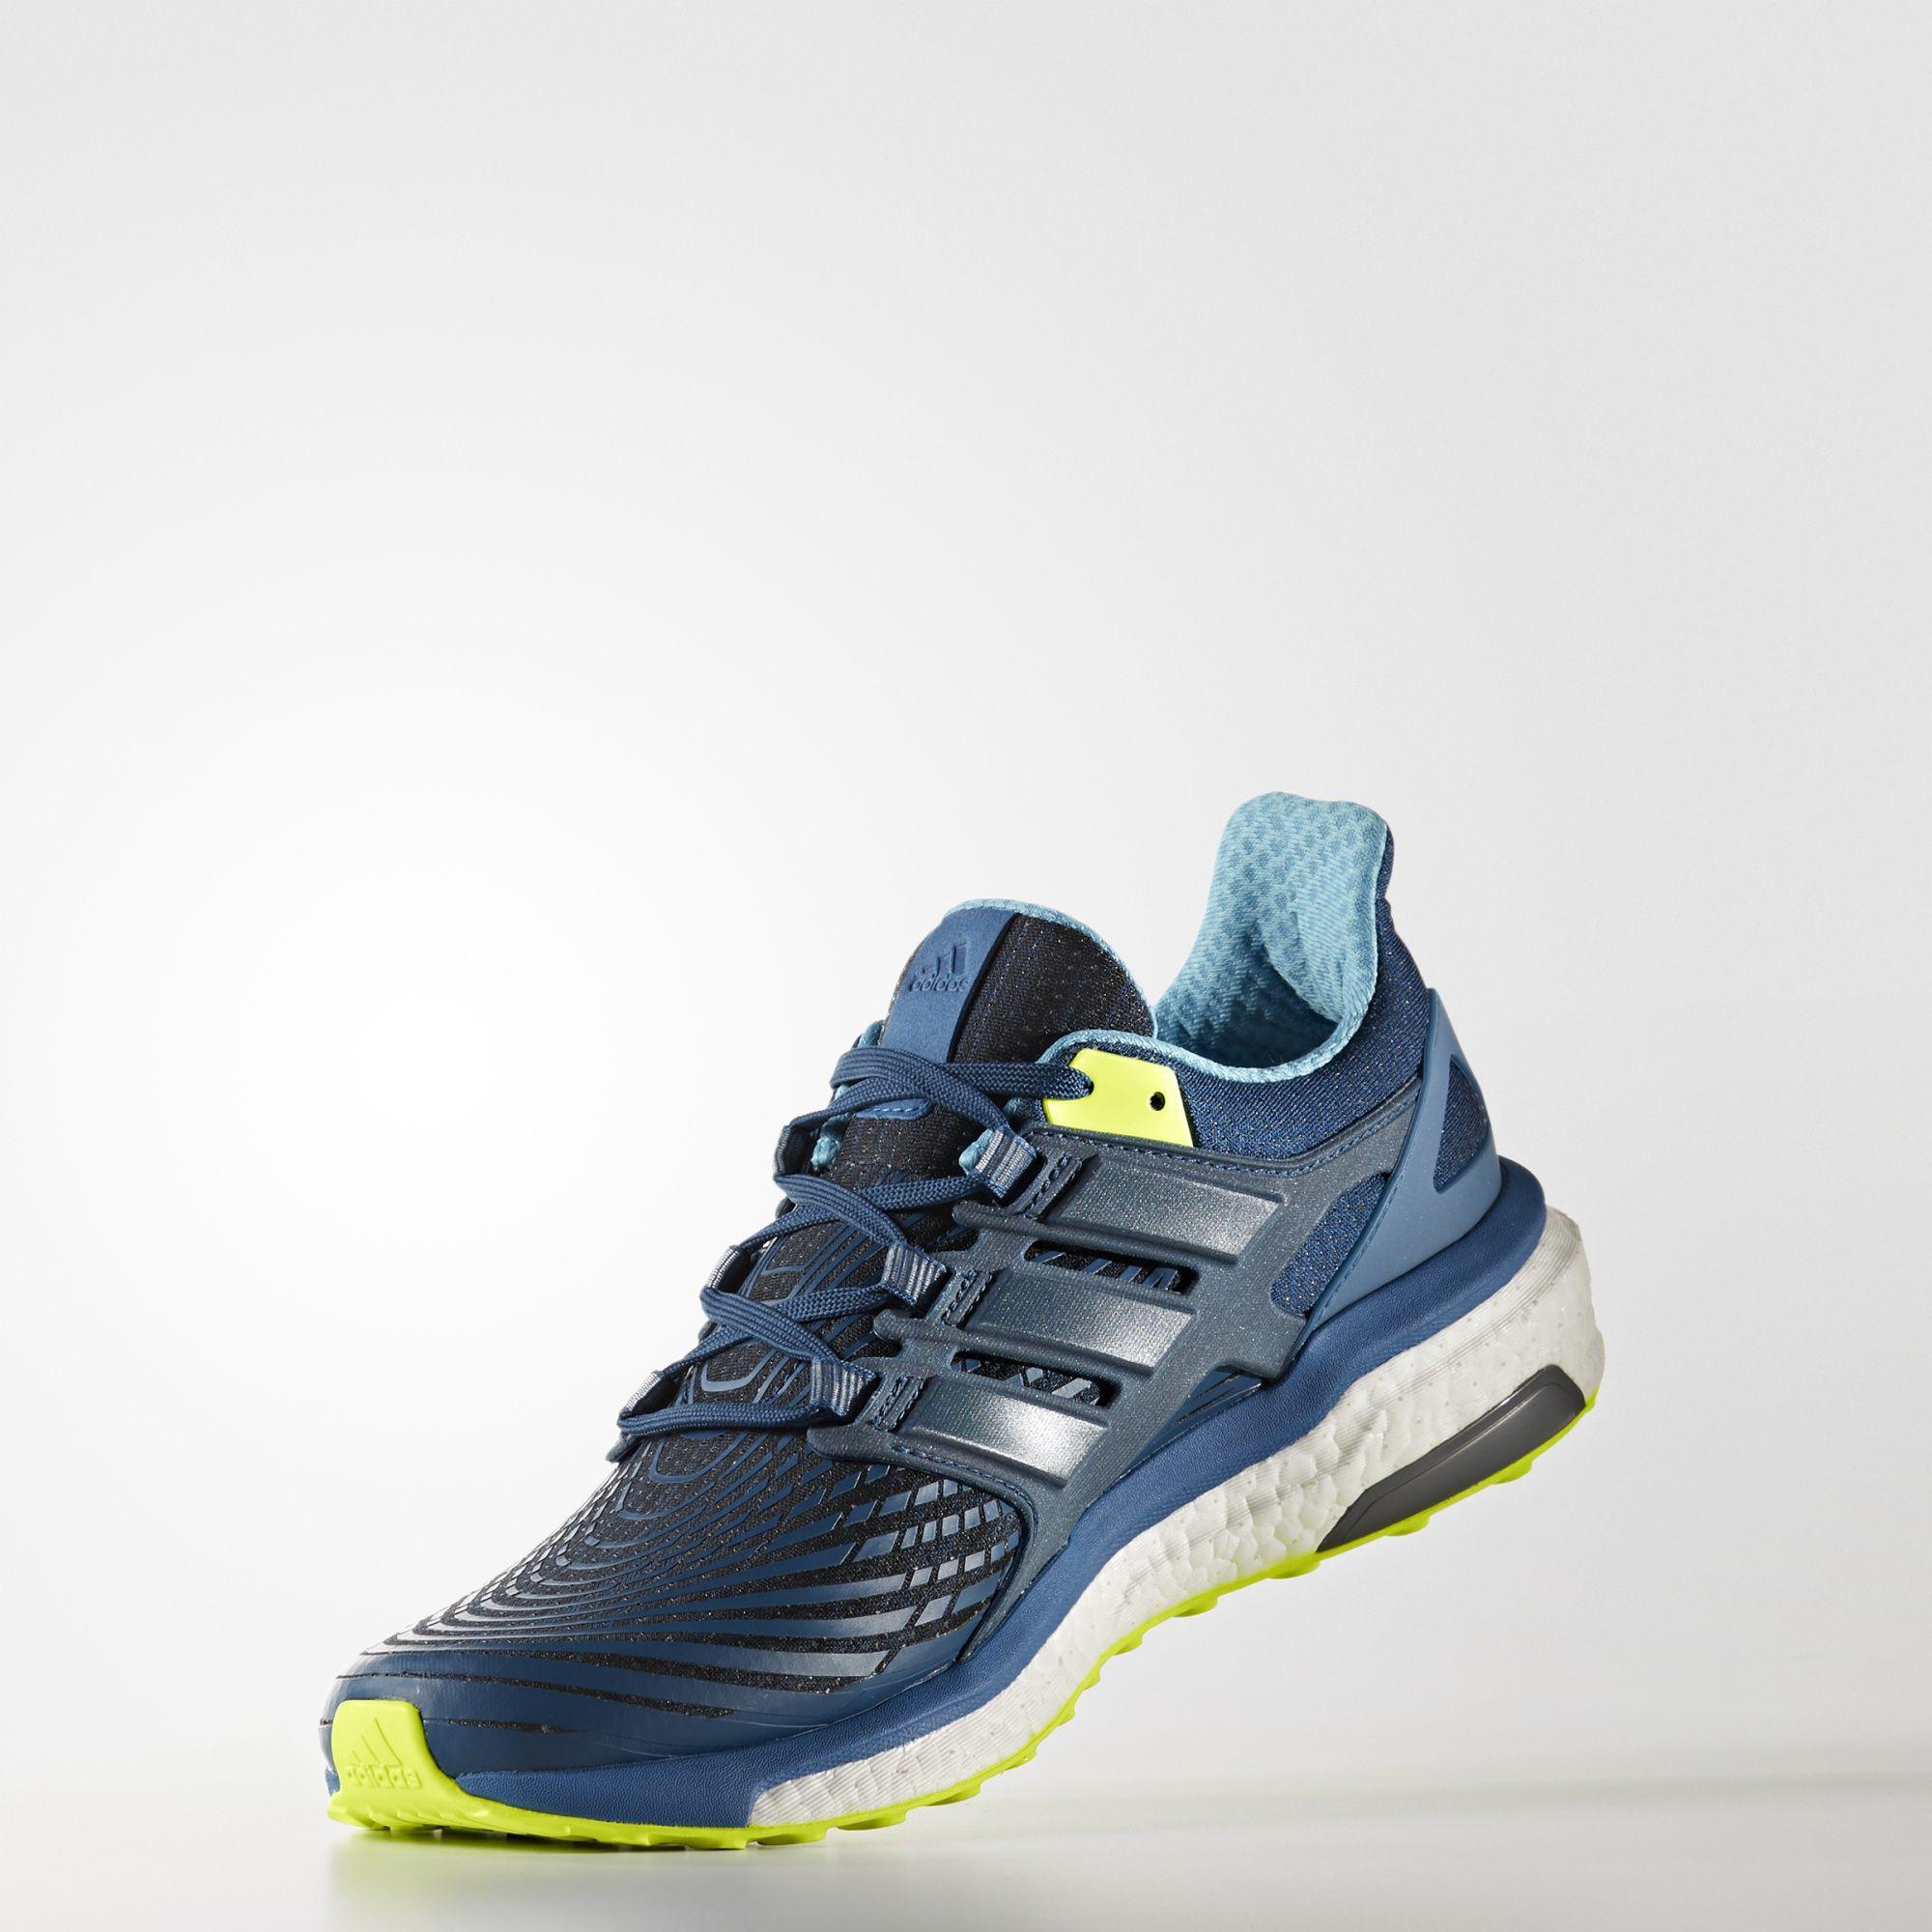 c94675ae5 Adidas Mens Energy Boost Running Shoes - Blue Night - Tennisnuts.com